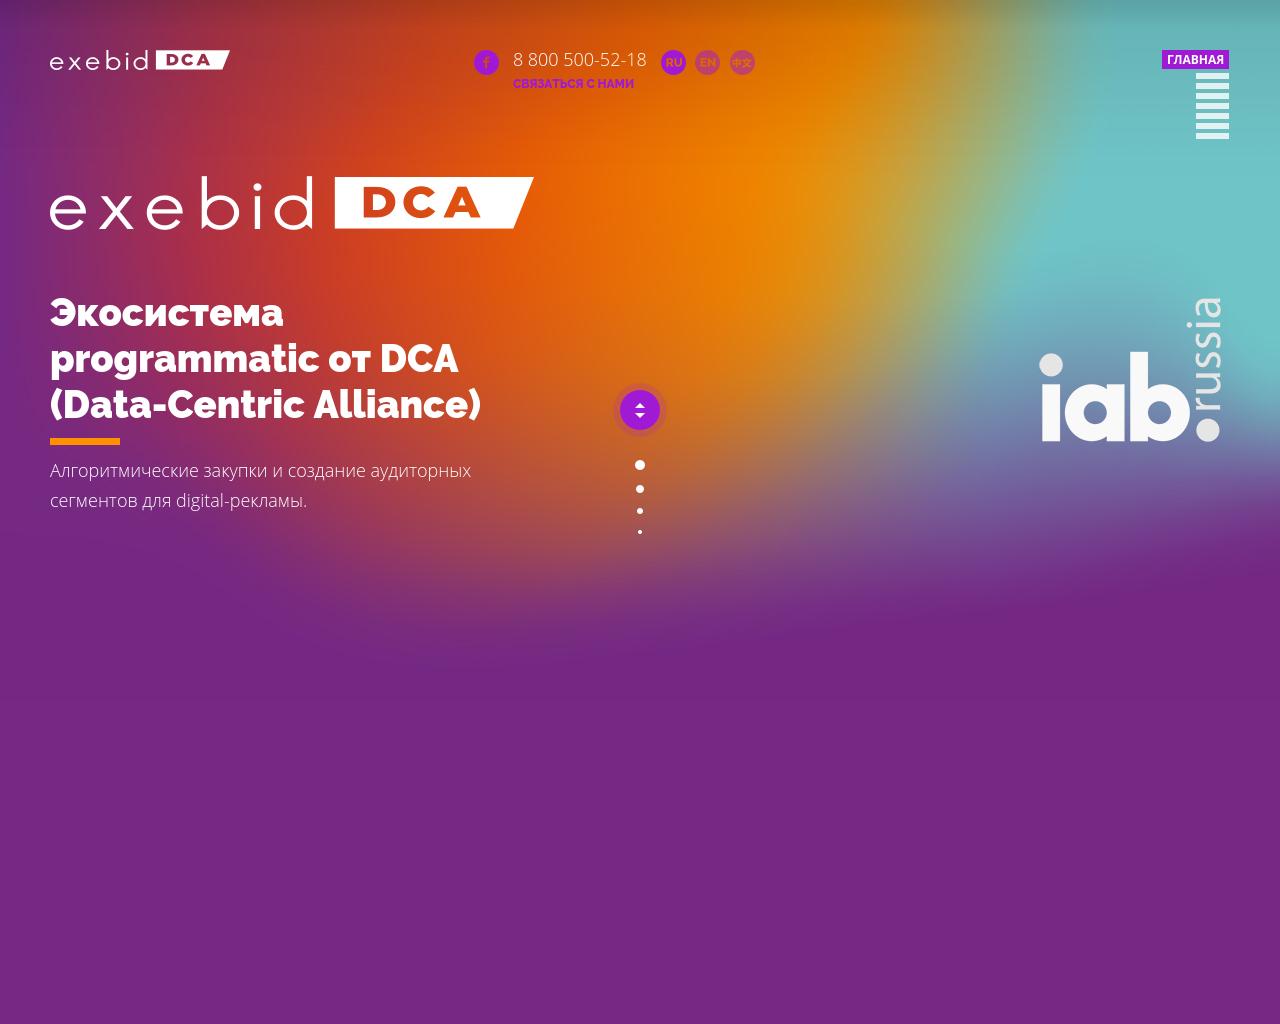 exebid-DCA-Advertising-Reviews-Pricing